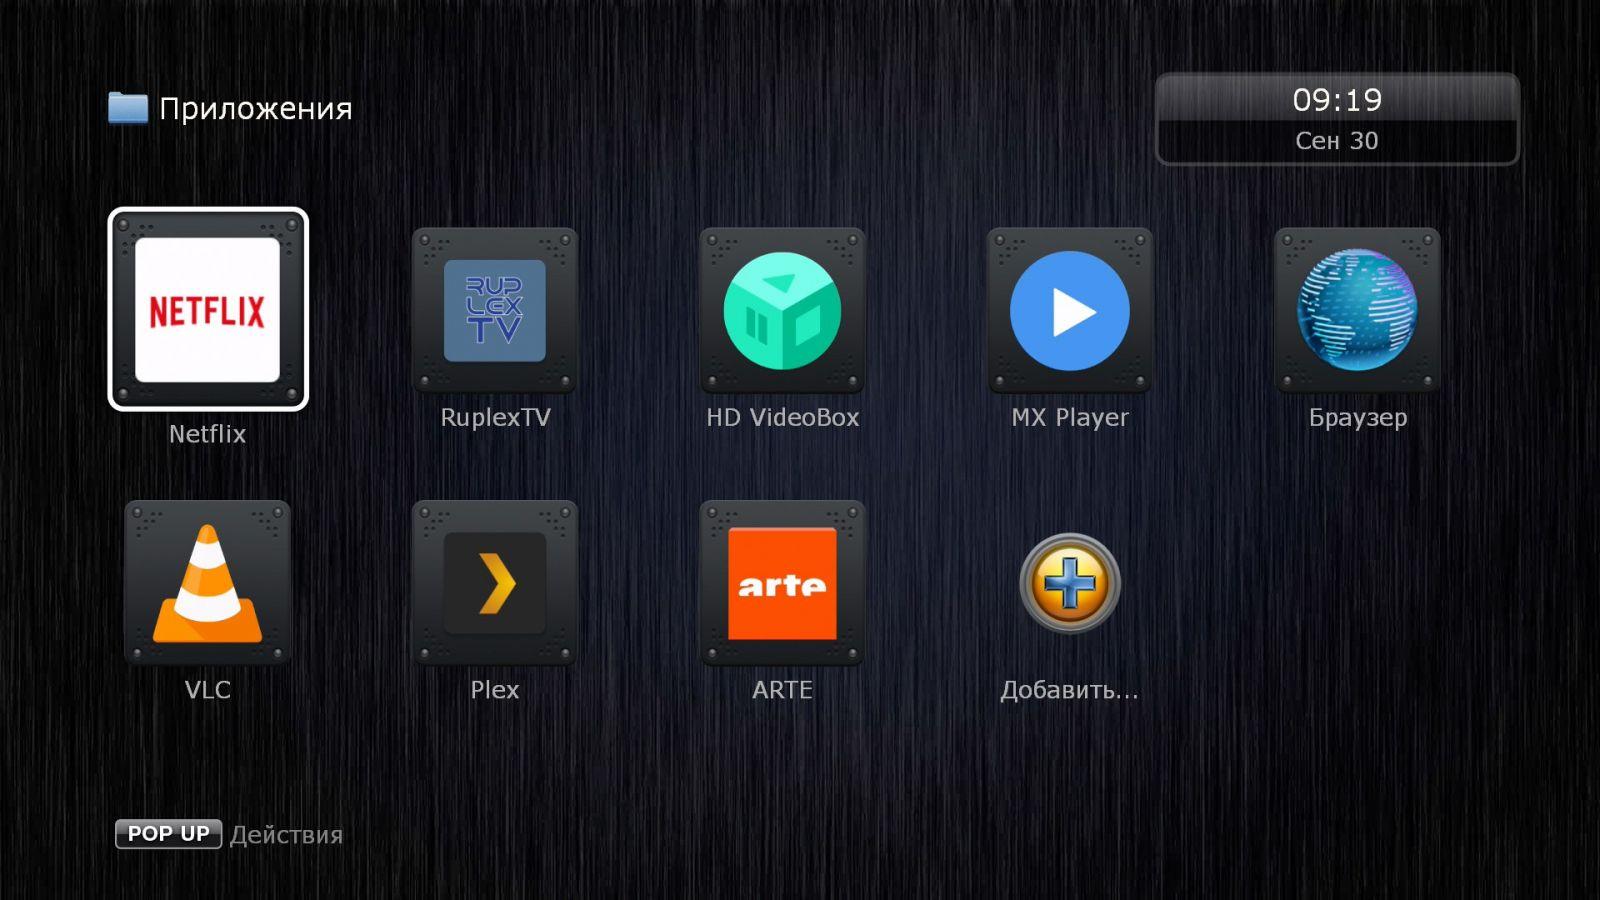 Приложения на приставке Kartina X